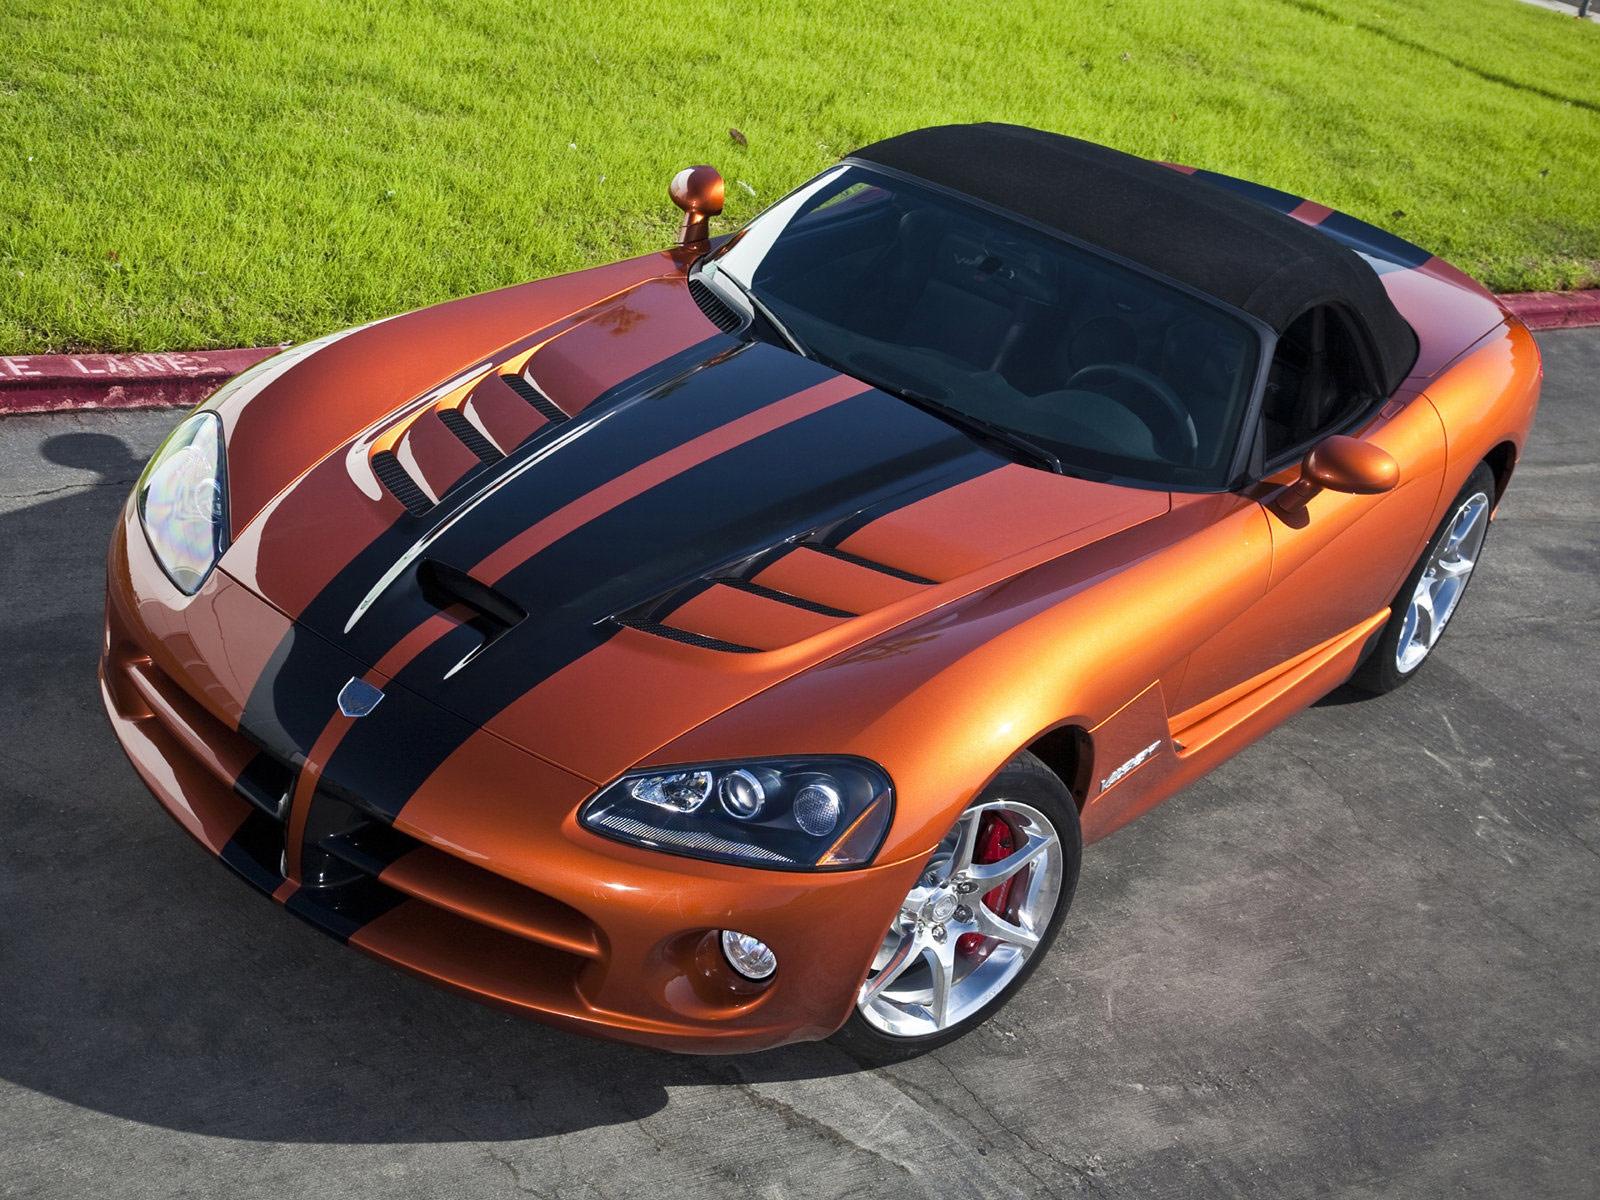 http://3.bp.blogspot.com/-8HRvNcJB4Hg/Trn34CeZykI/AAAAAAAADoA/uMqbInY09V0/s1600/Dodge-Viper_SRT10_2010_car-desktop-wallpaper_1.jpg